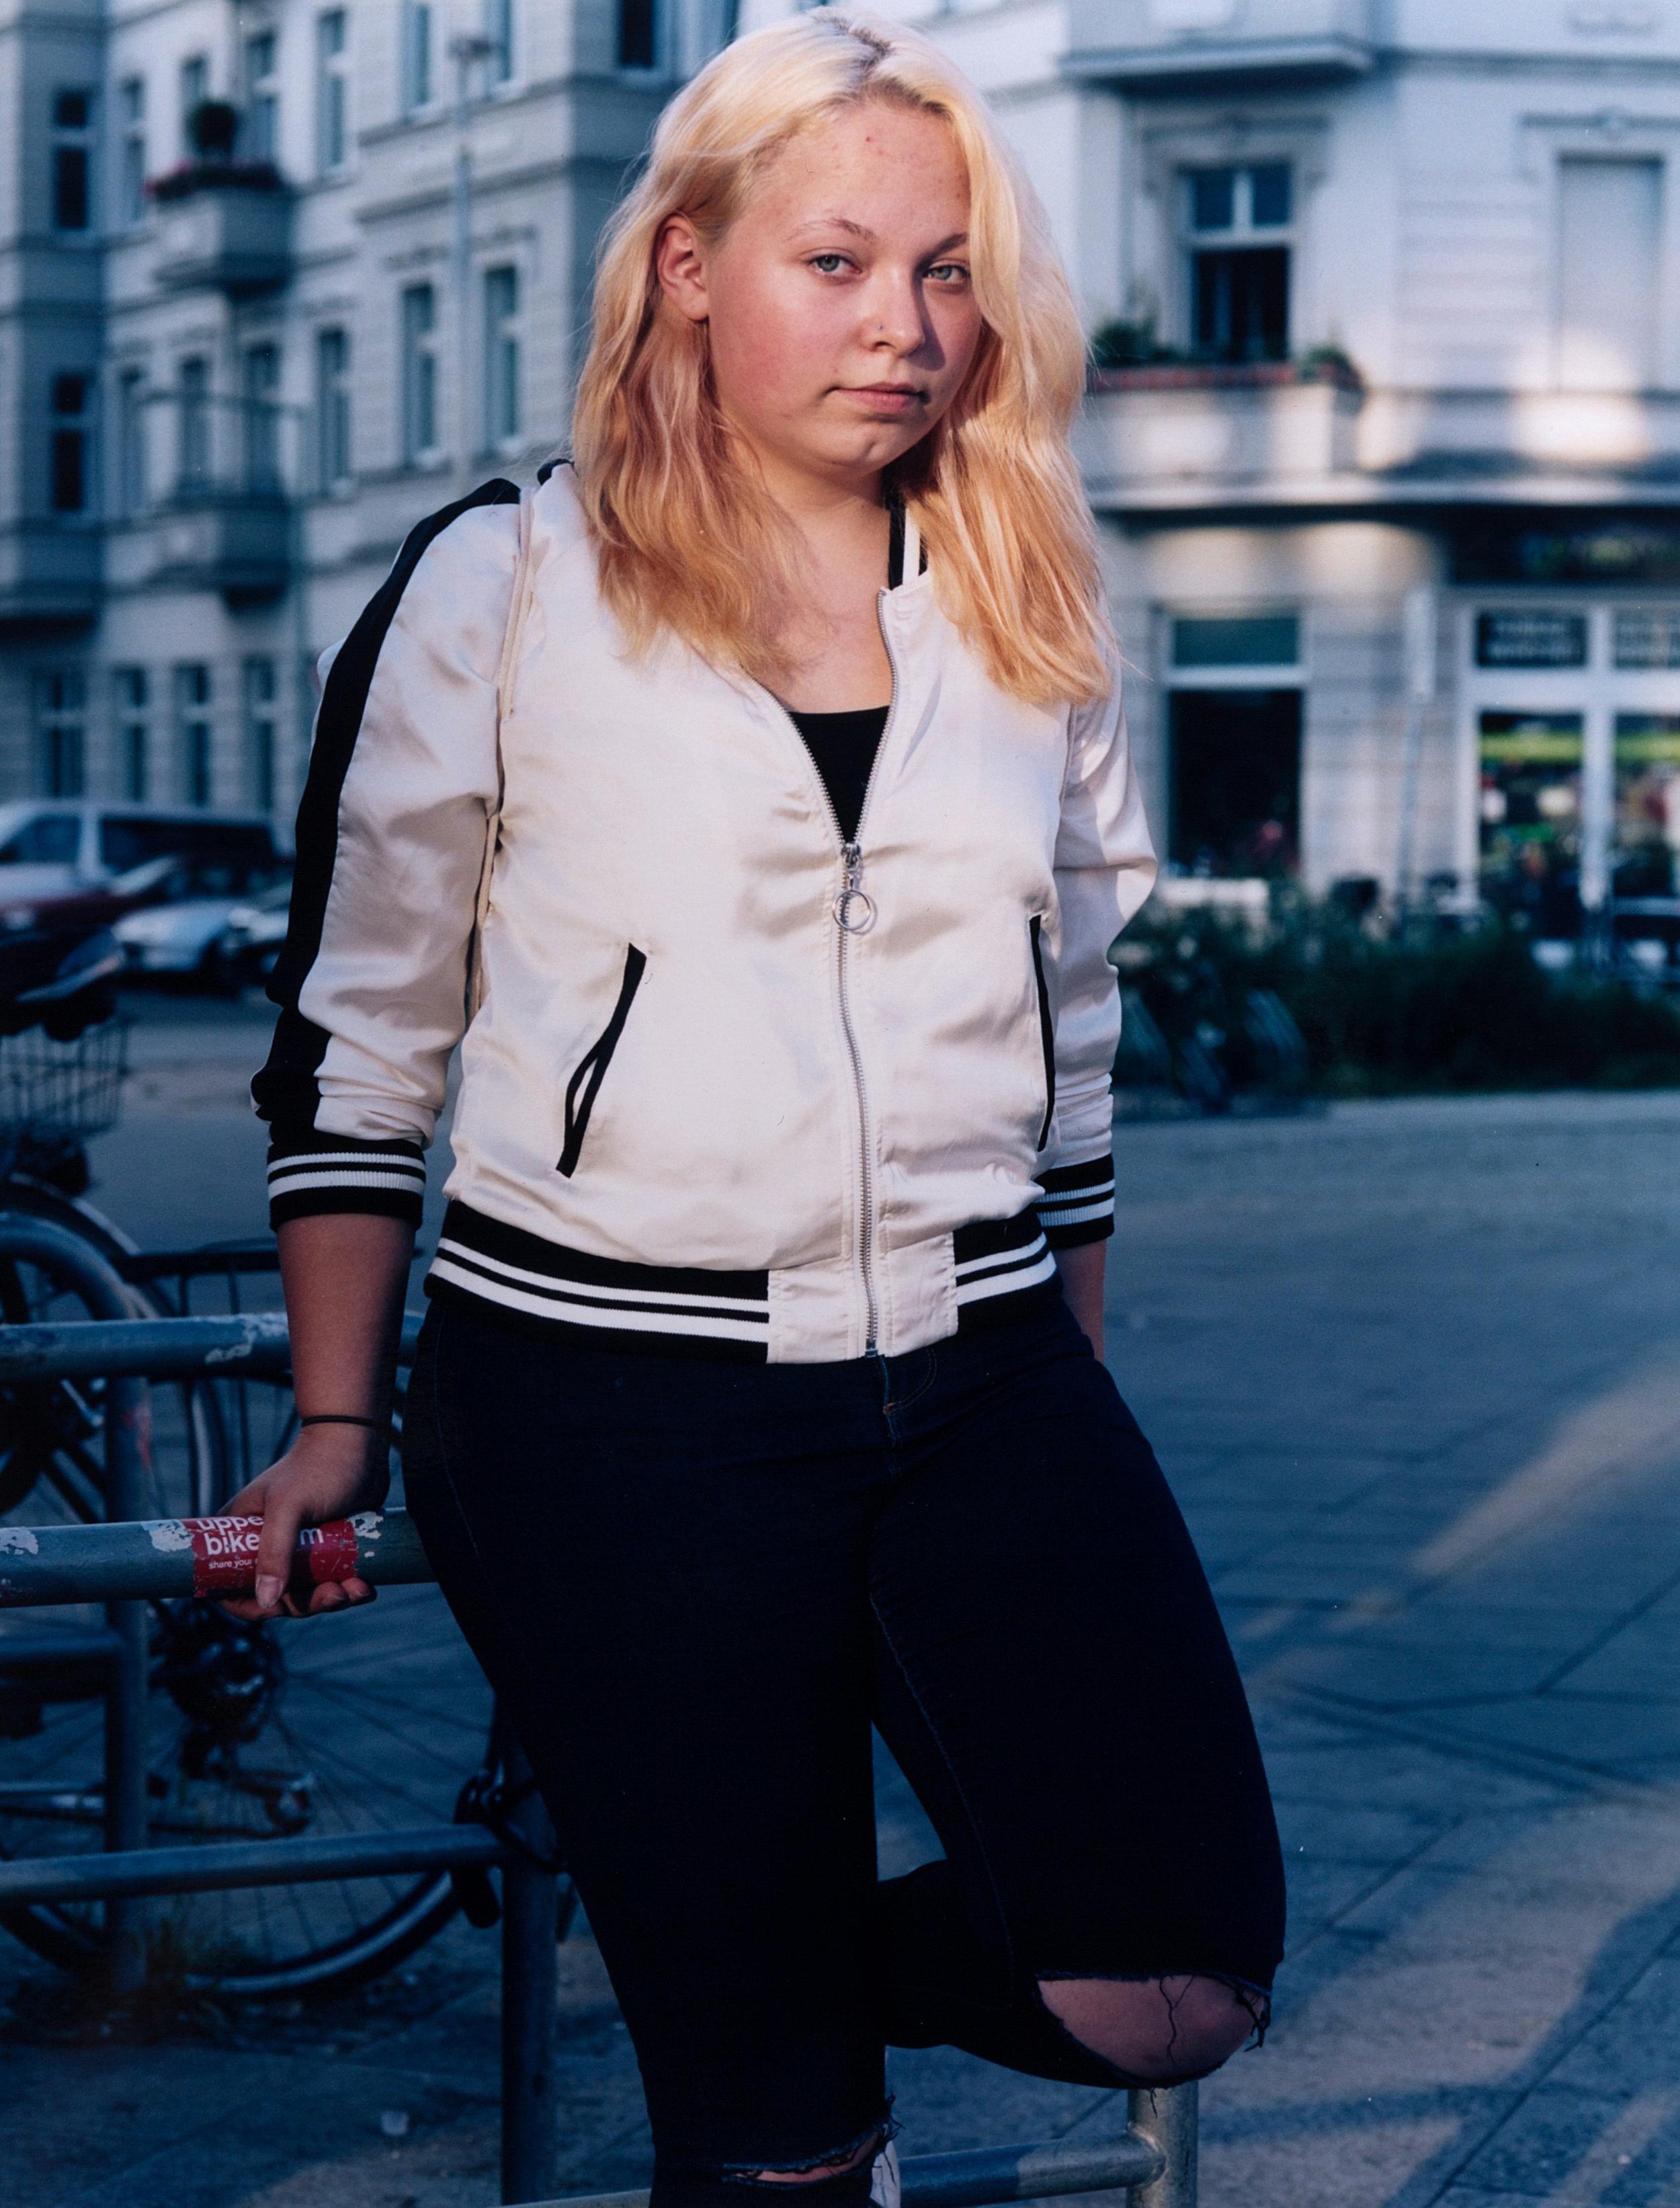 Dana, Berlin, Germany